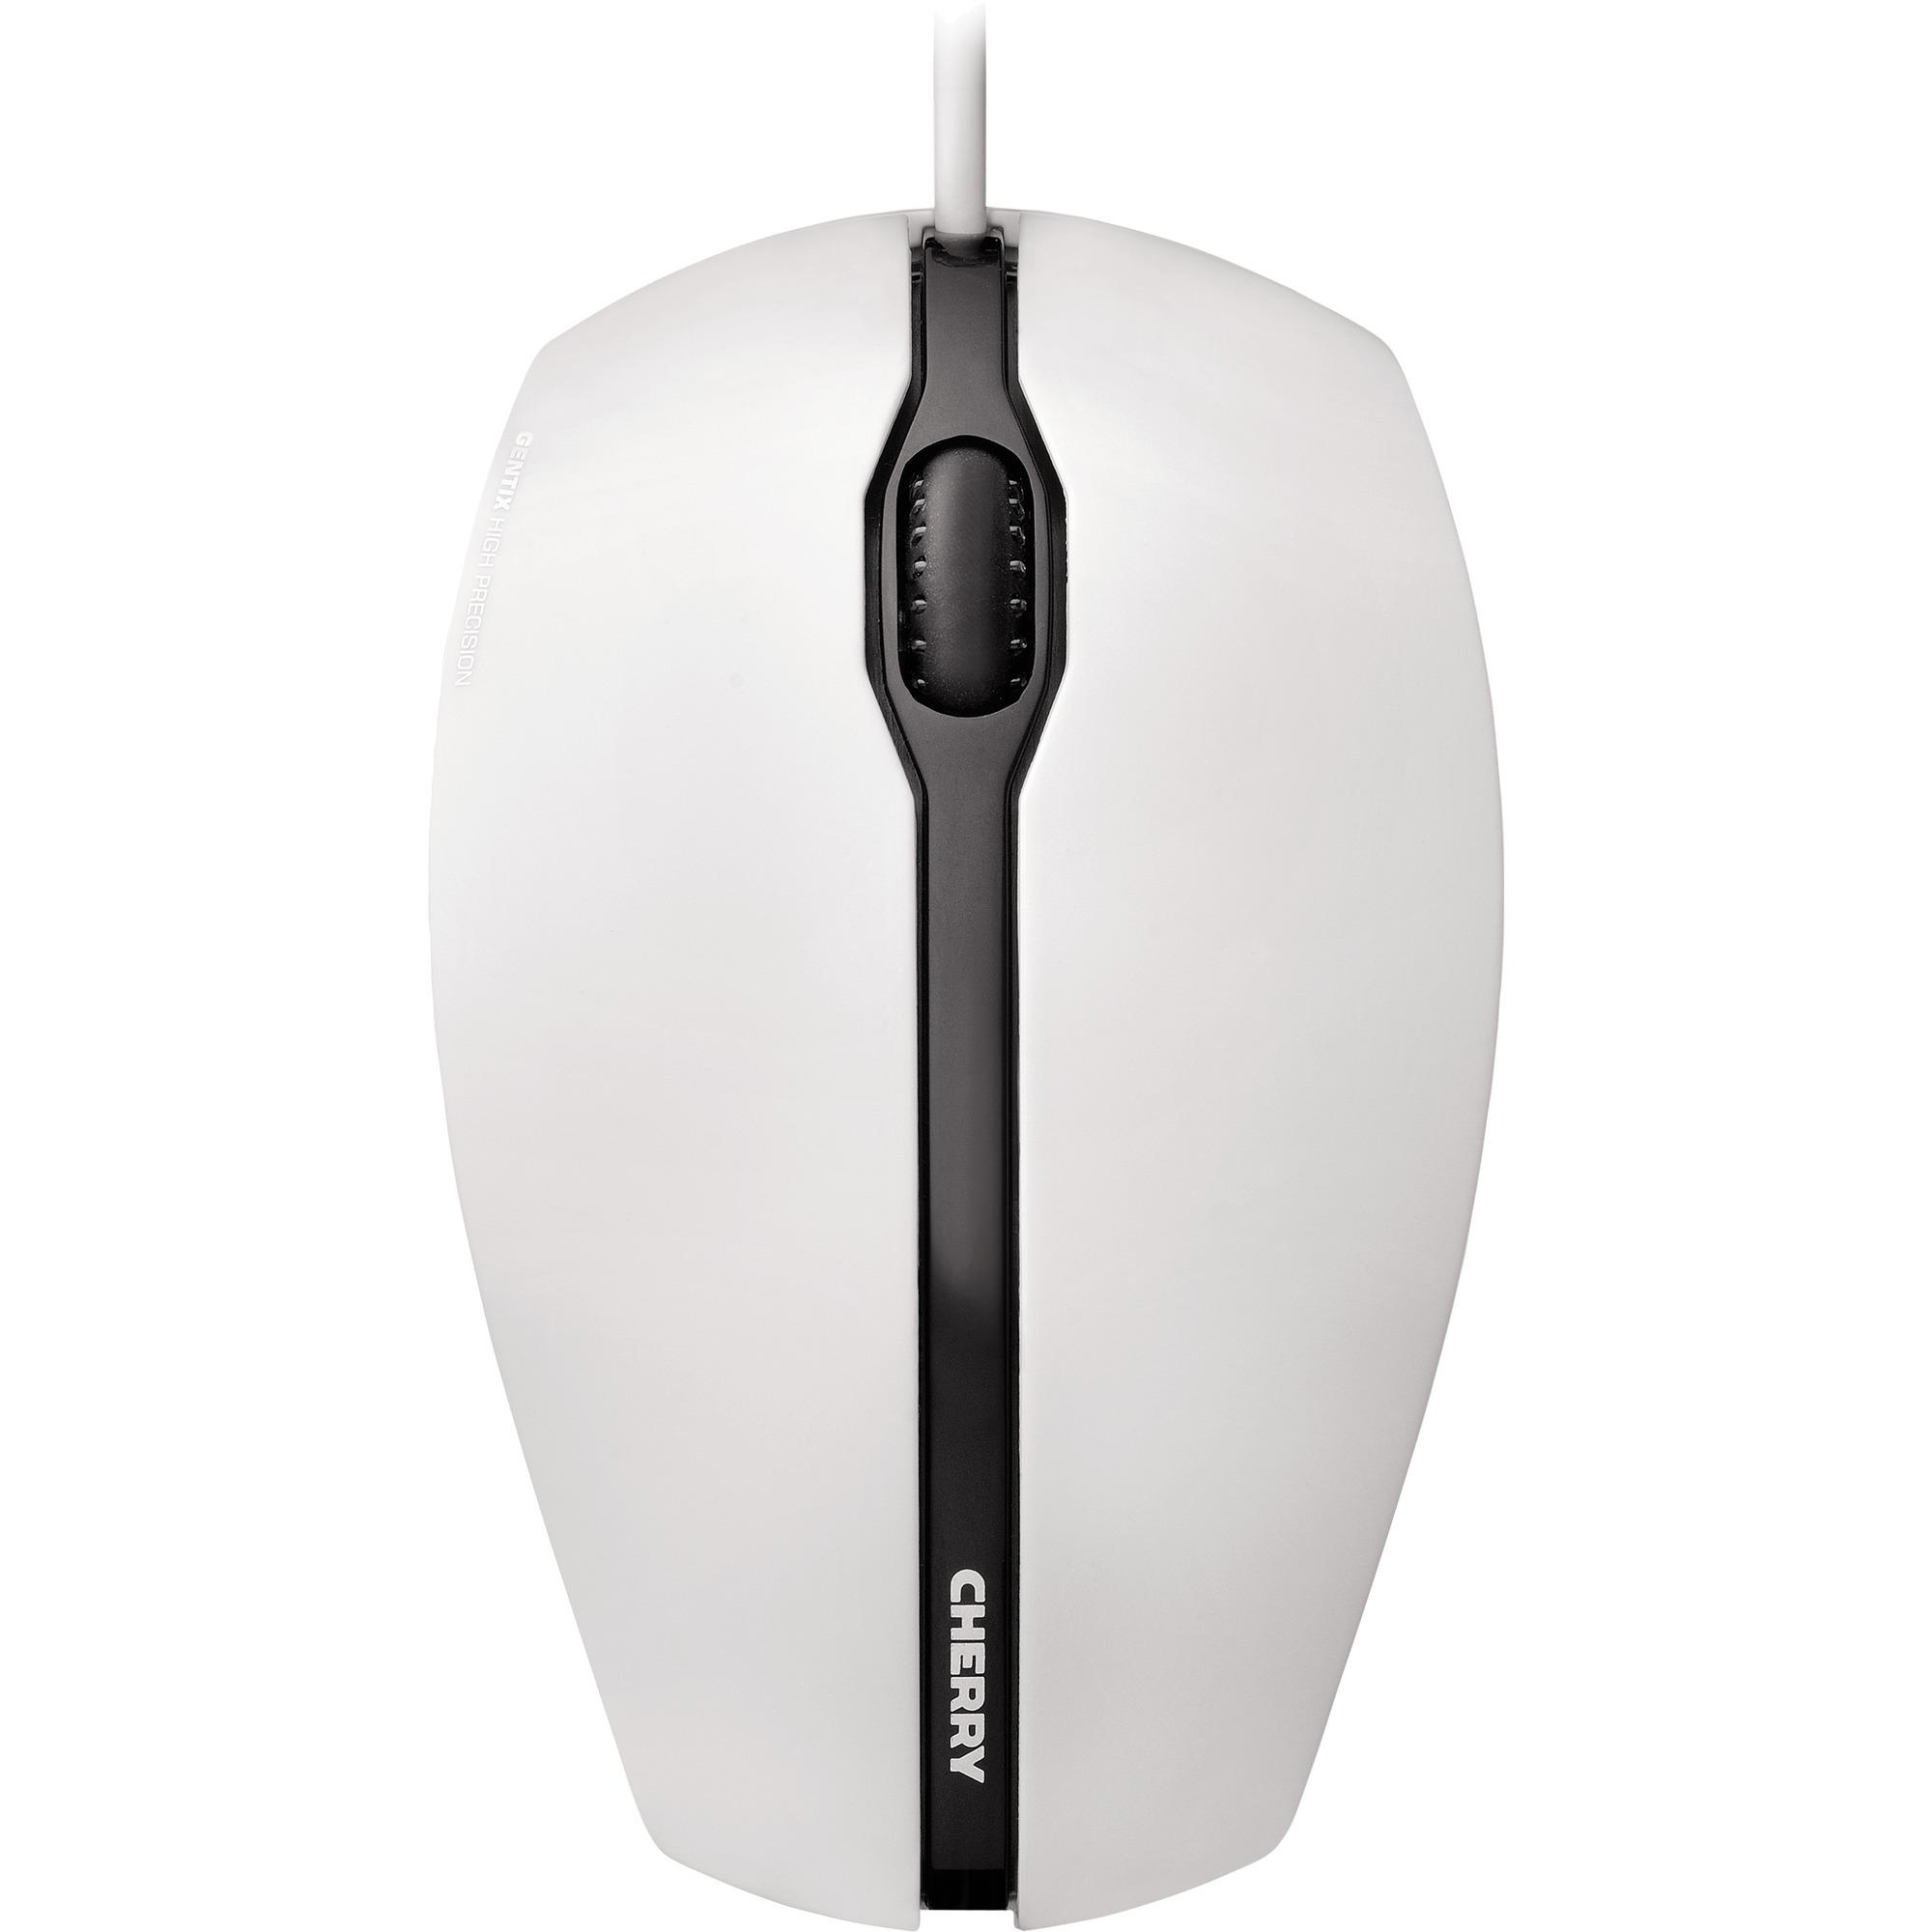 GENTIX ratón USB Óptico 1000 DPI Ambidextro Negro, Gris